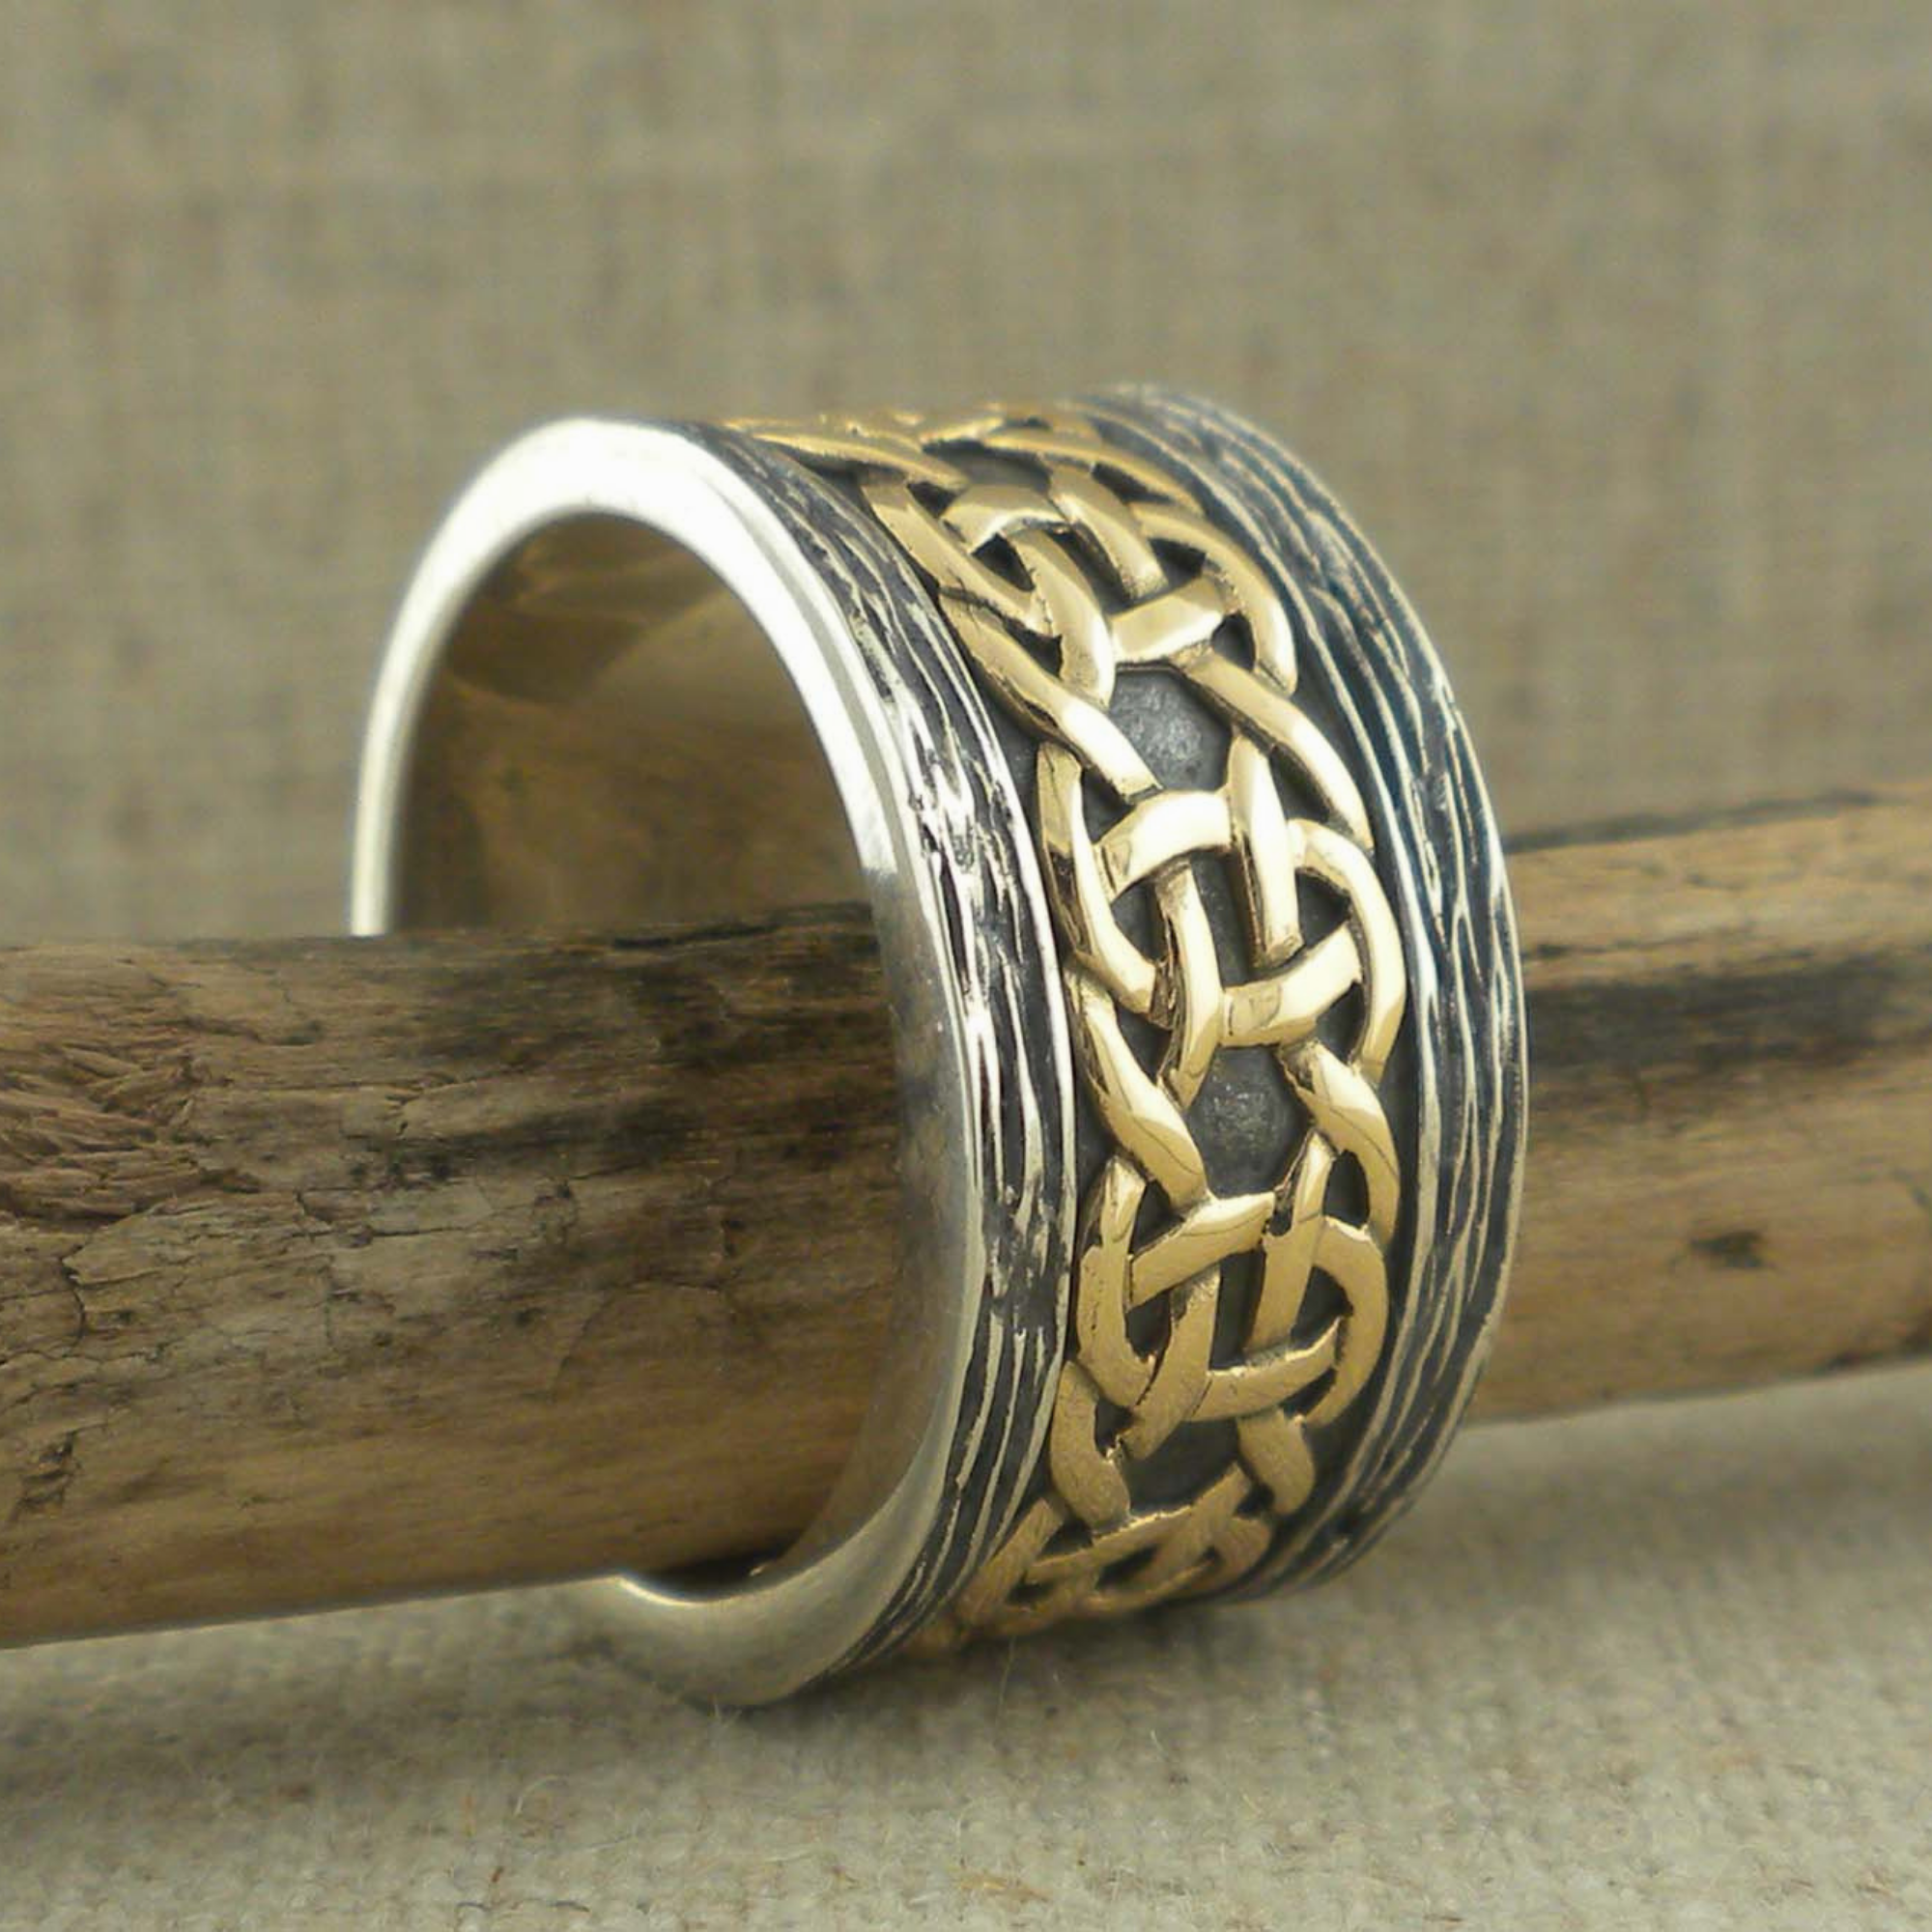 Keith Jack Scavaig Wedding Ring